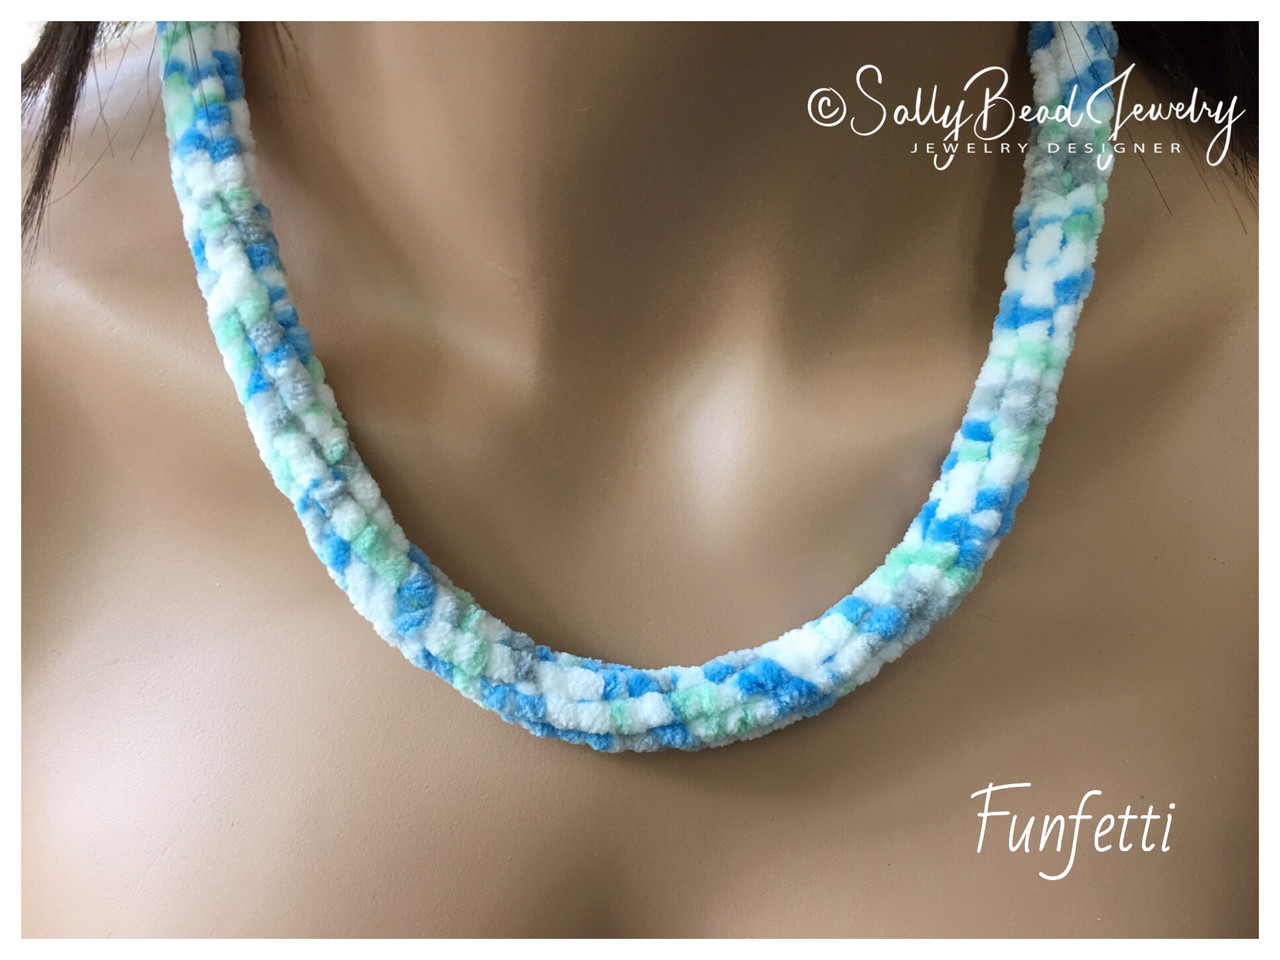 Chenille Yarn - Funfetti - Sally Bead Jewelry